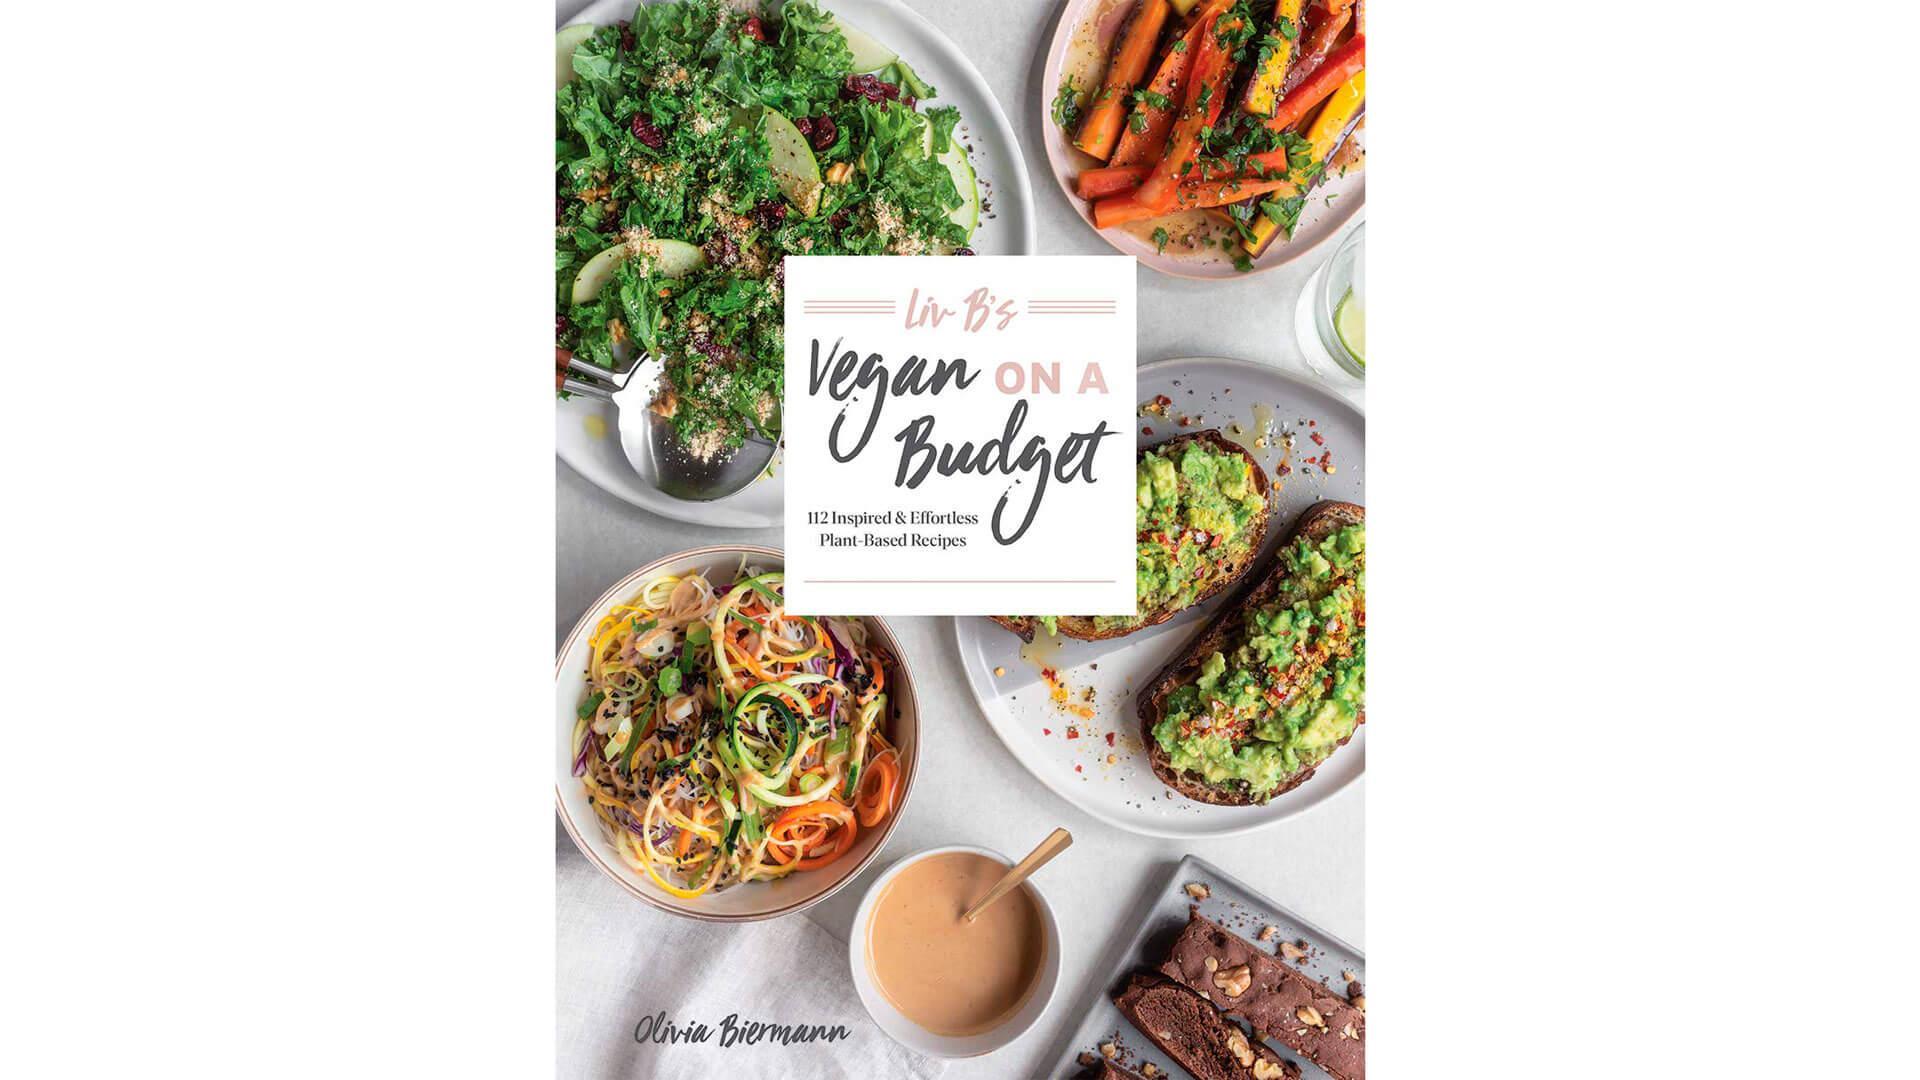 Vegan Cookbook: Liv B's Vegan on a Budget